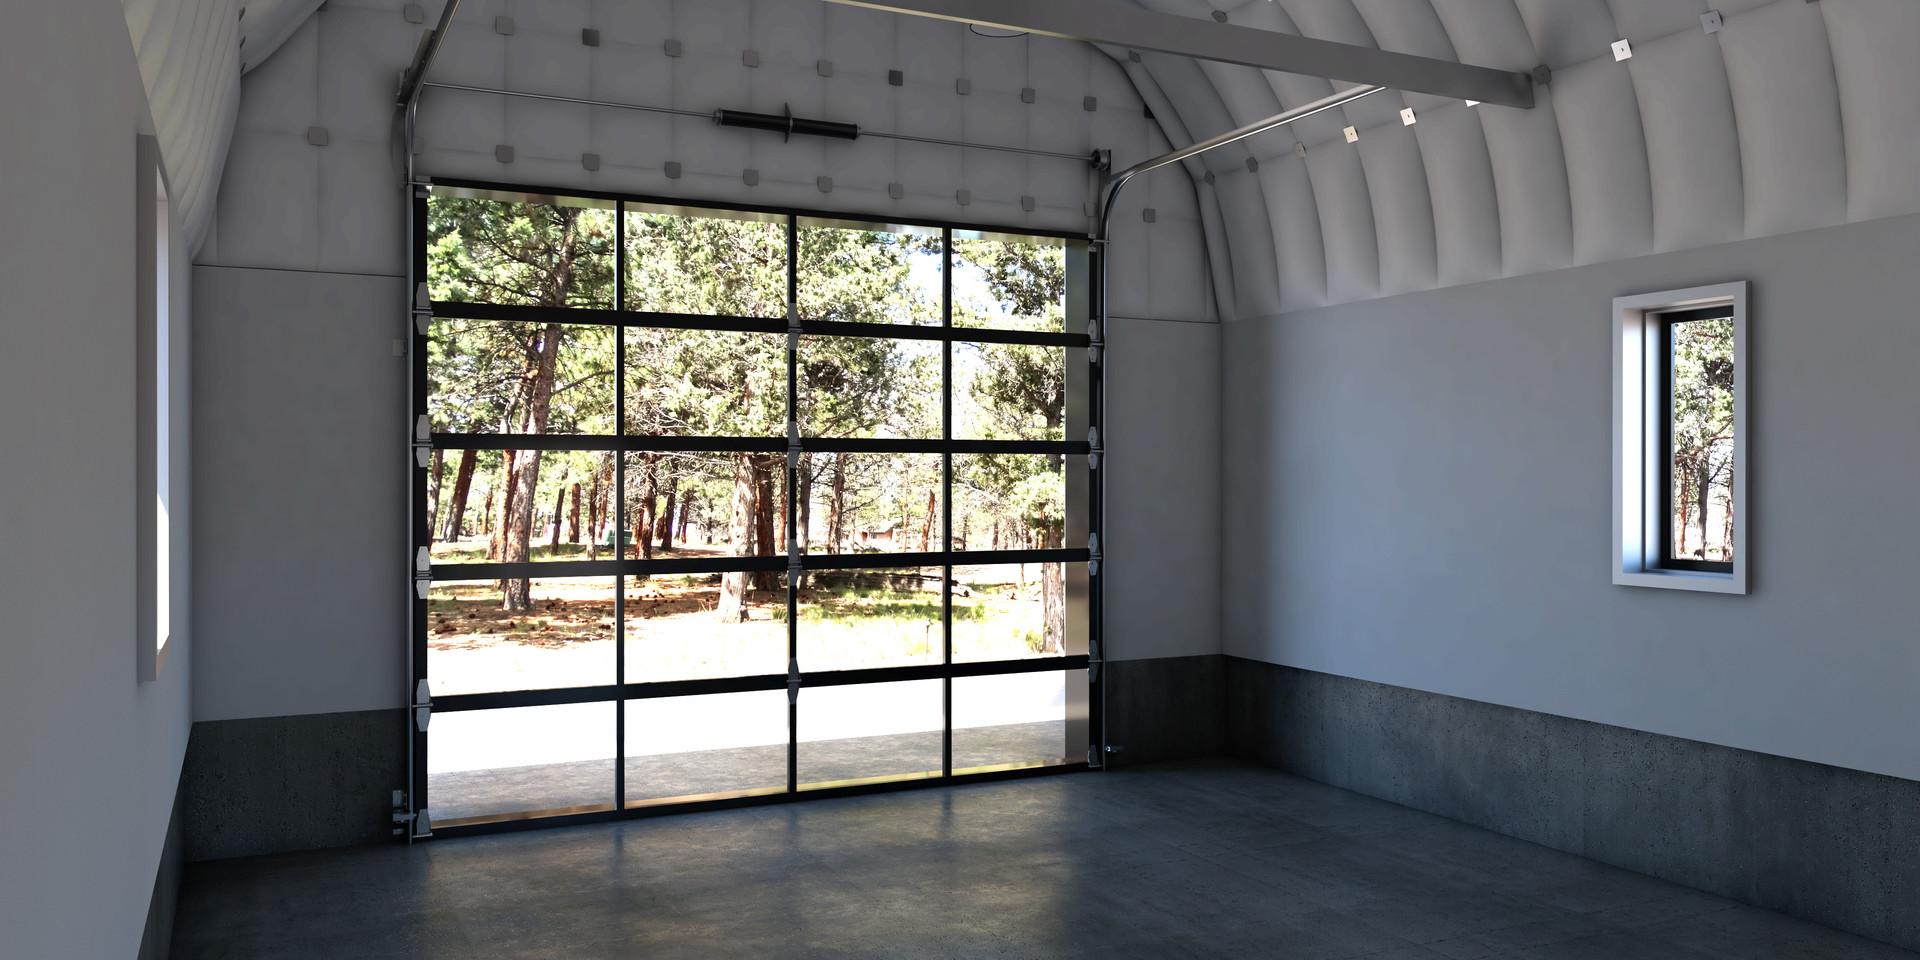 Small Workshop Interior_original setting